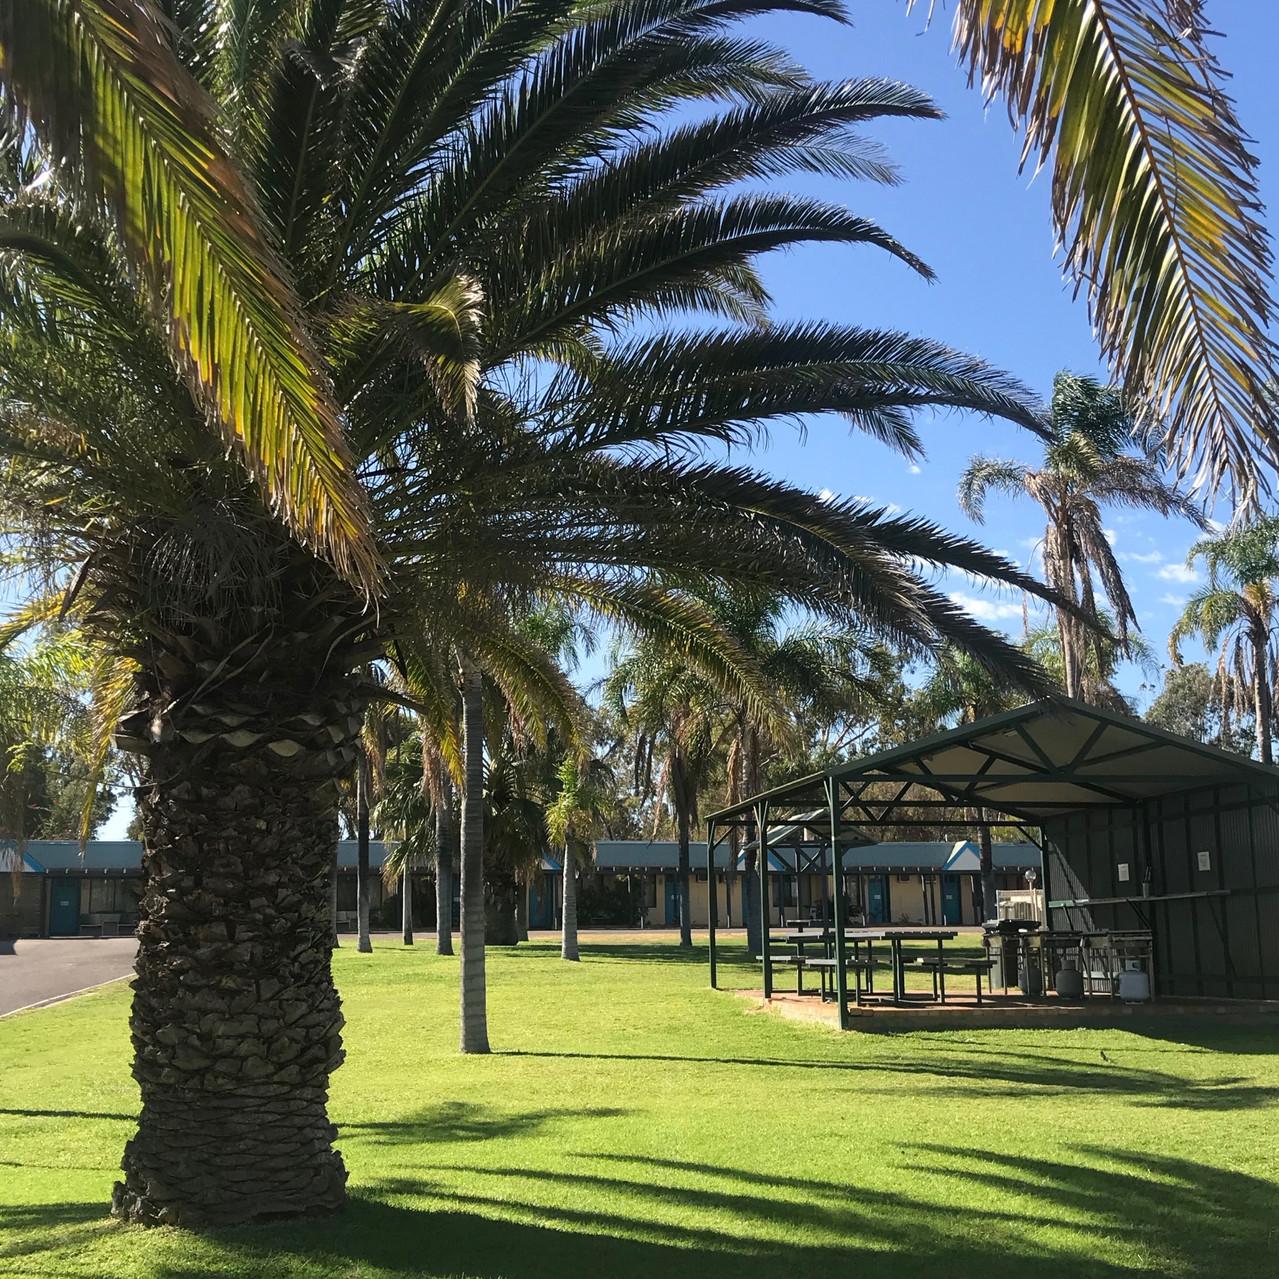 Palms at the Palms Resort